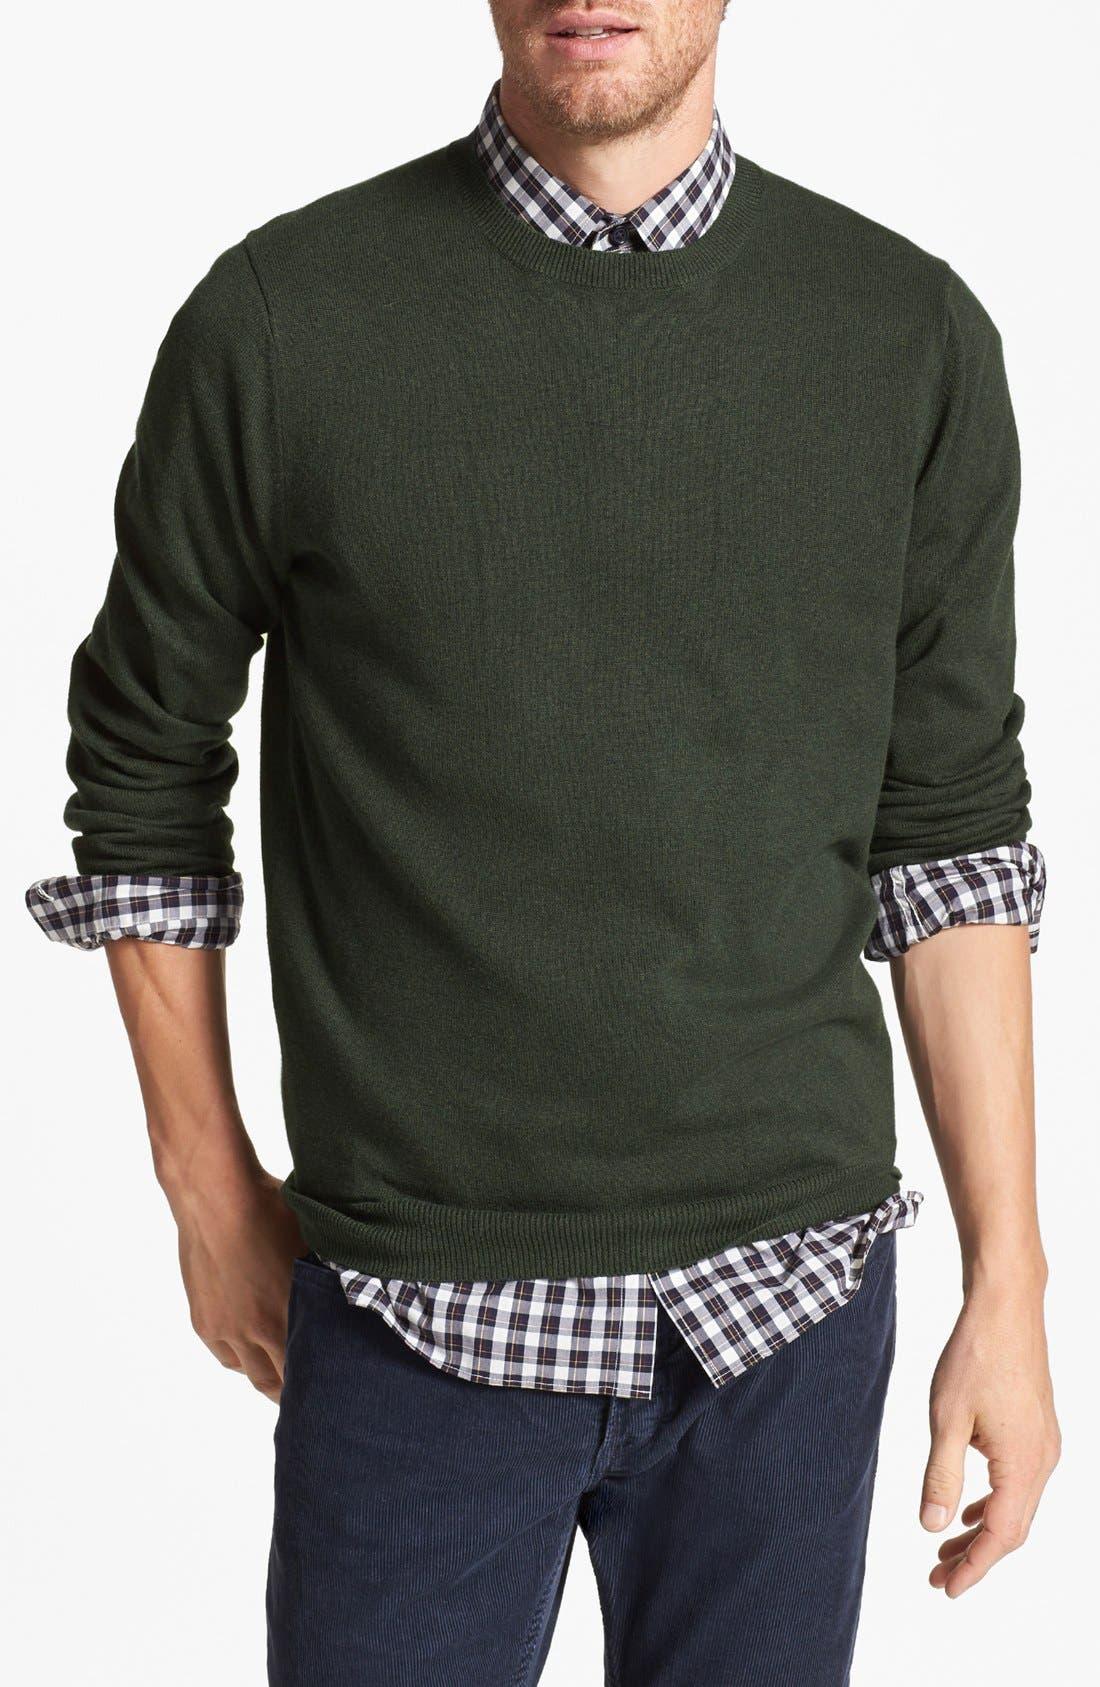 Alternate Image 1 Selected - Wallin & Bros. Trim Fit Cotton & Cashmere Crewneck Sweater